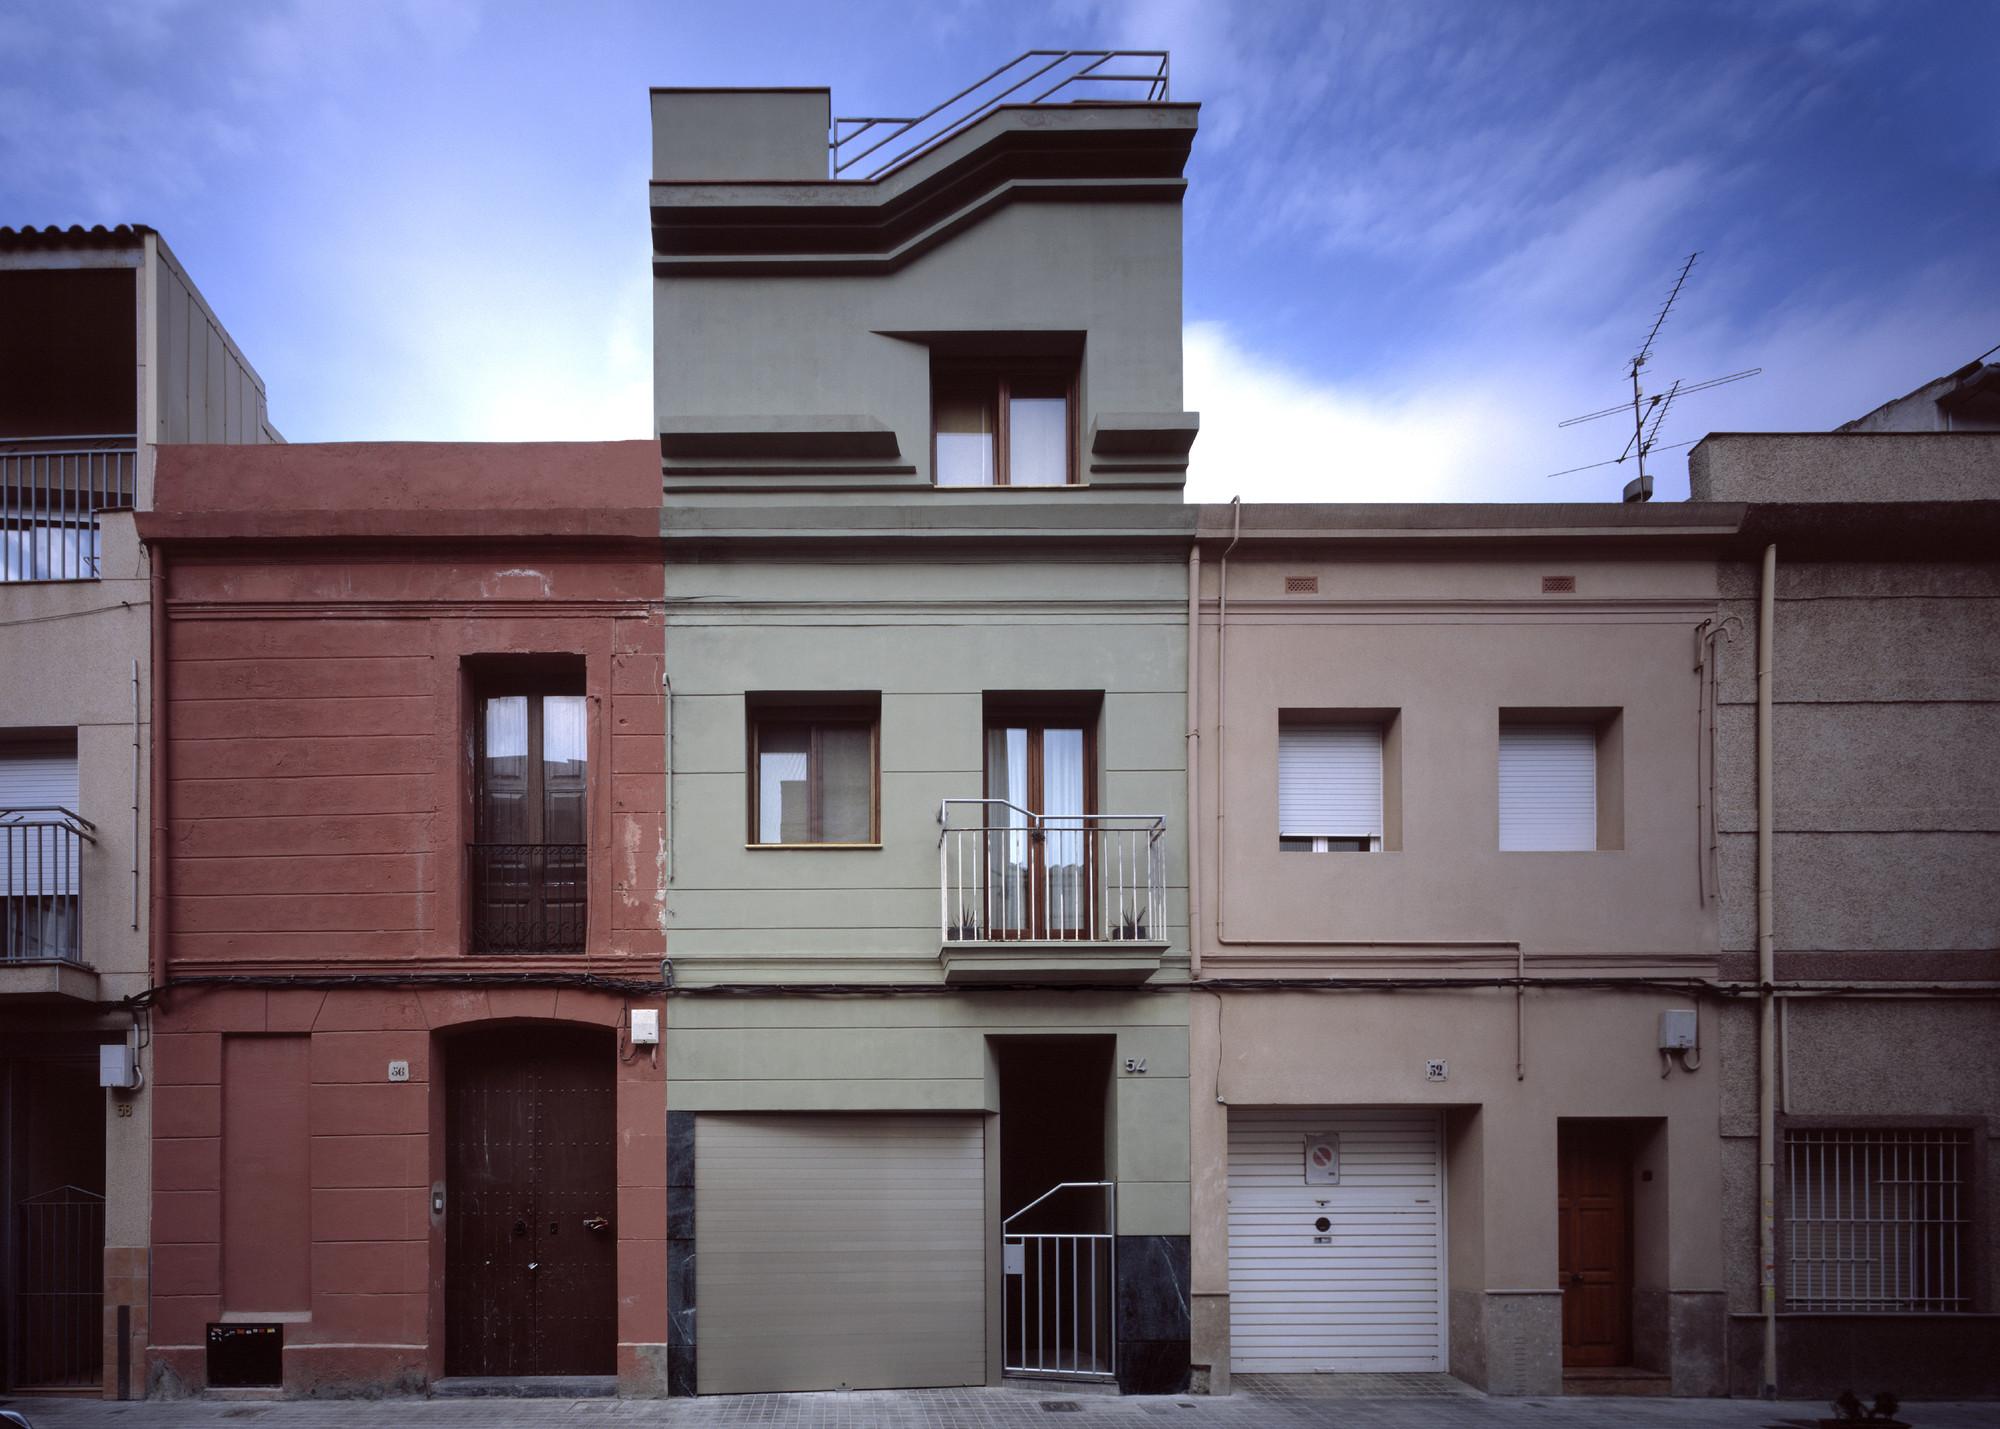 Casa Providencia en Barcelona / Flores & Prats, © Hisao Suzuki